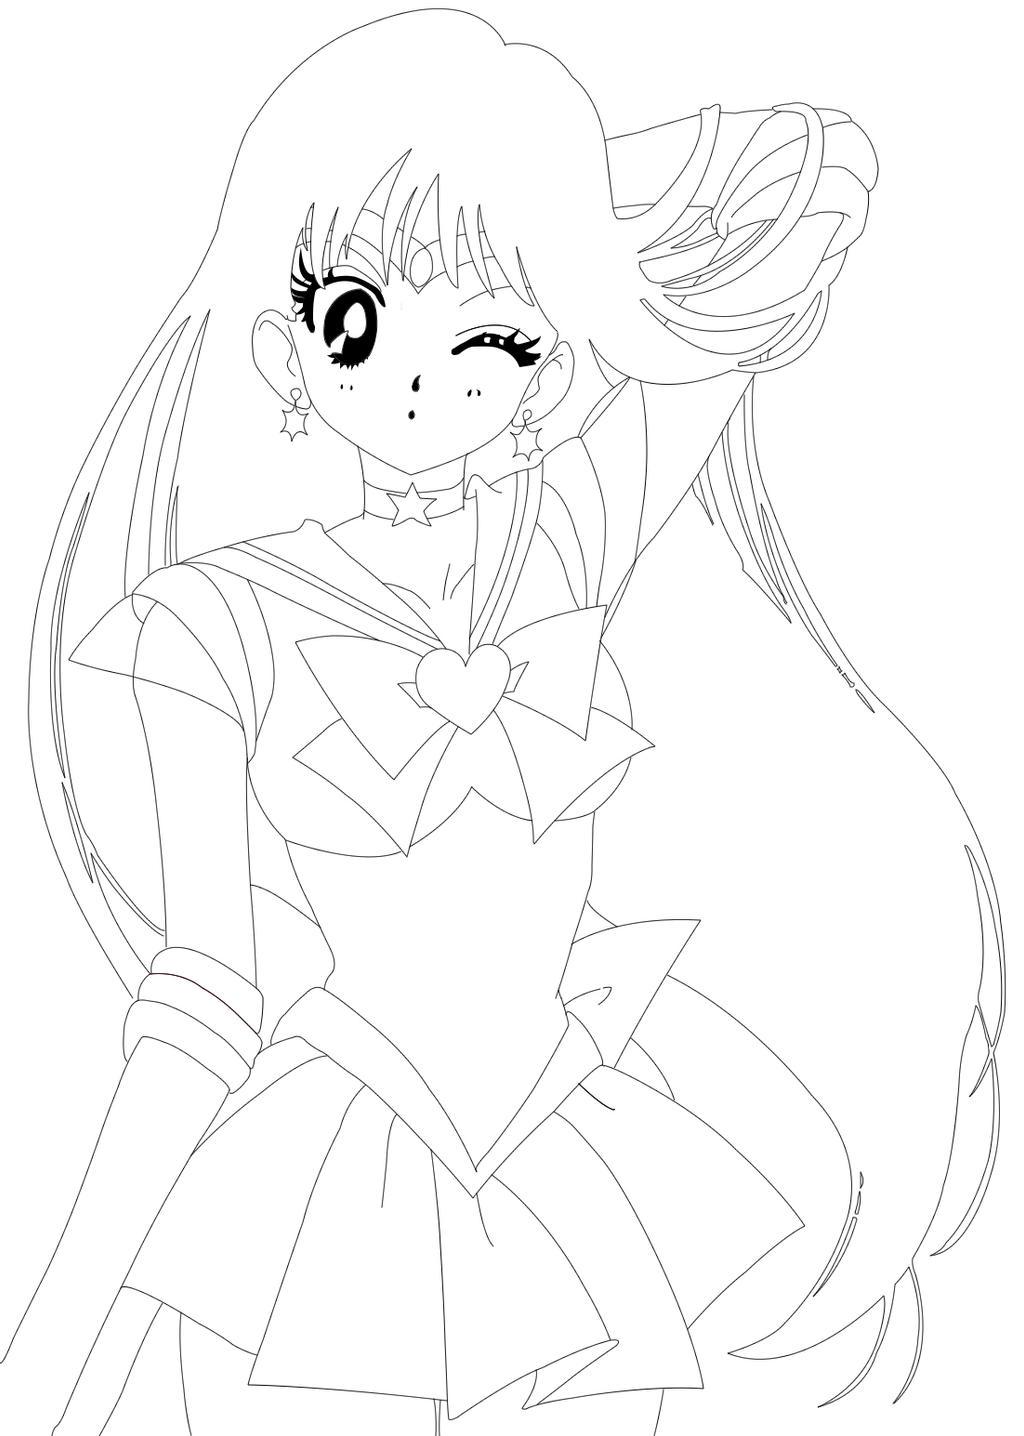 Sailor mars line art by j stan on deviantart for Sailor mars coloring pages